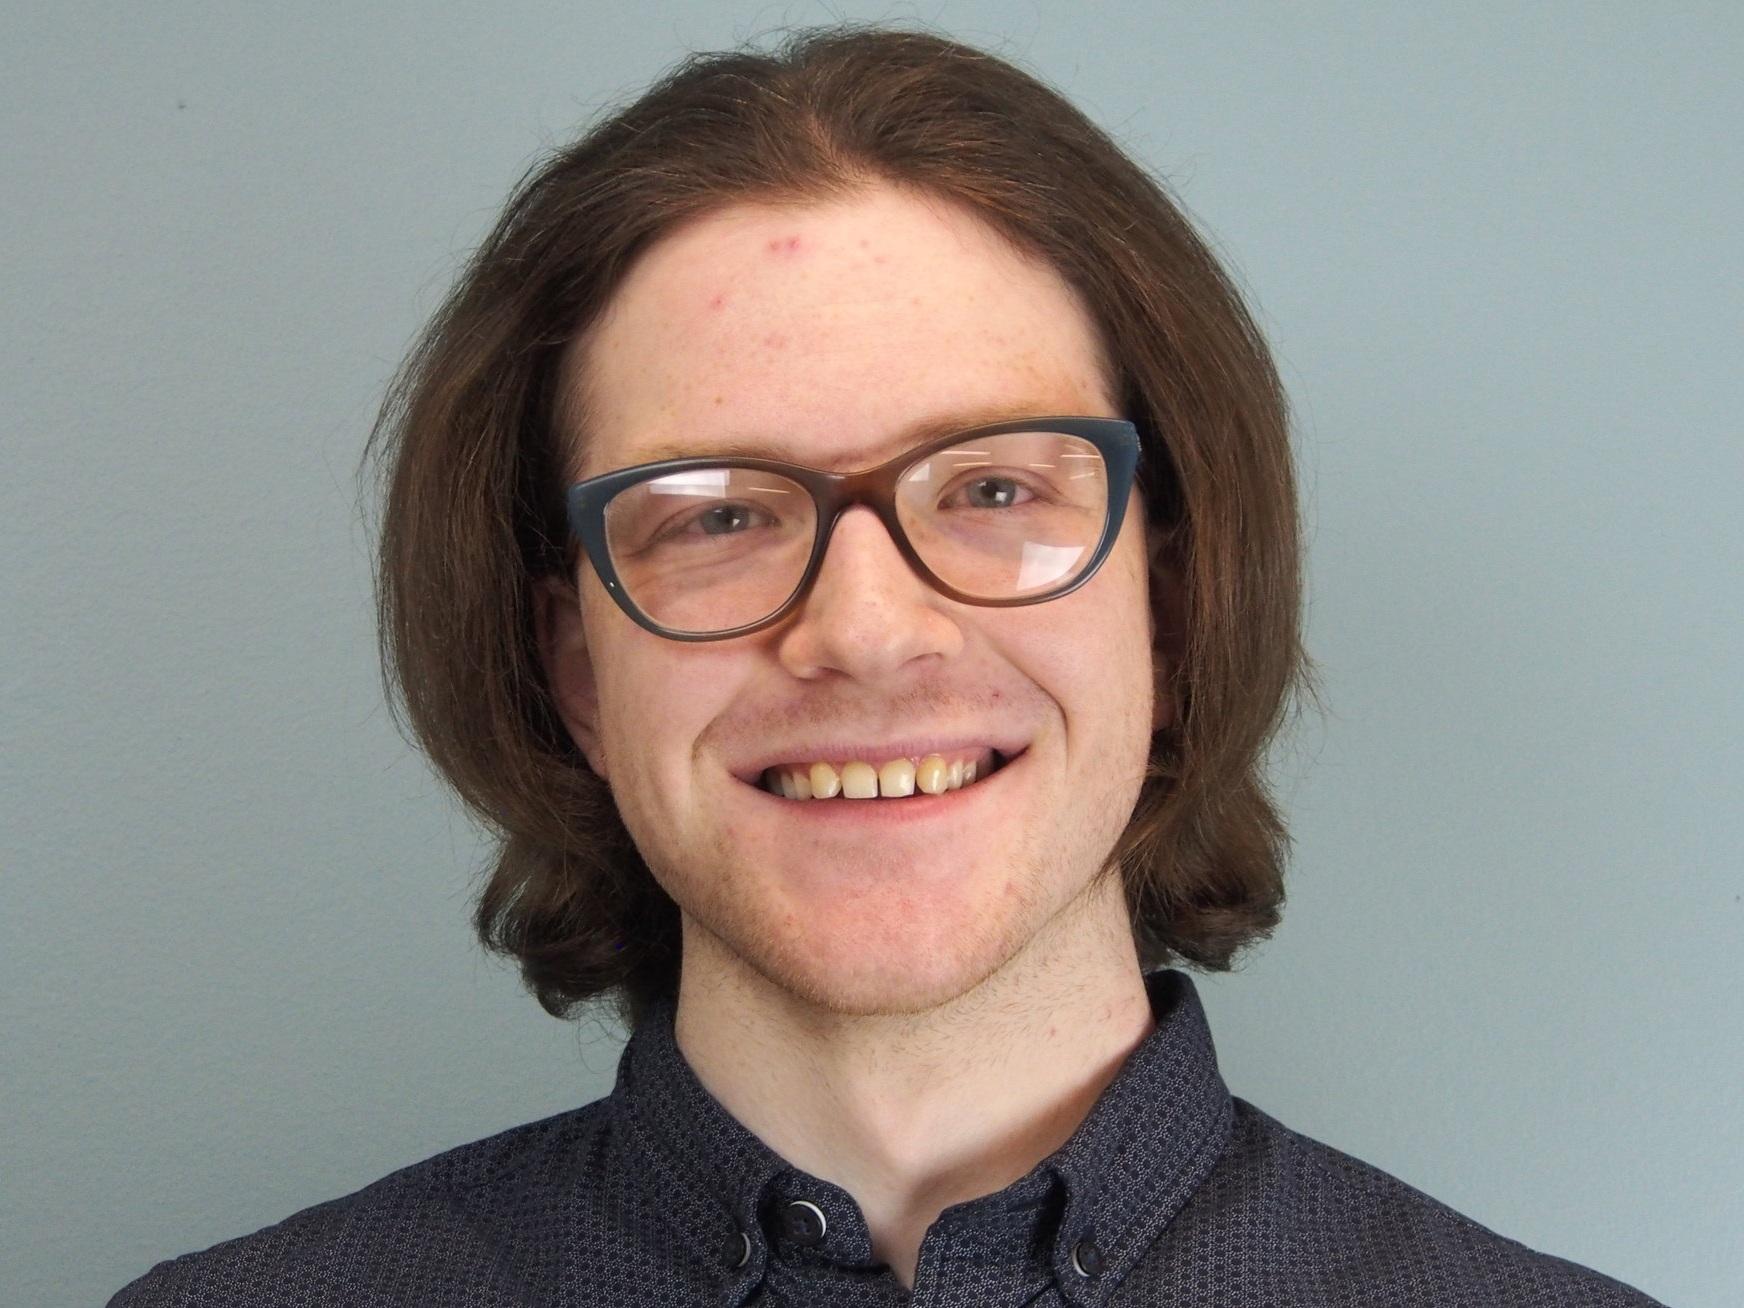 Undergraduate Liam Mitchell